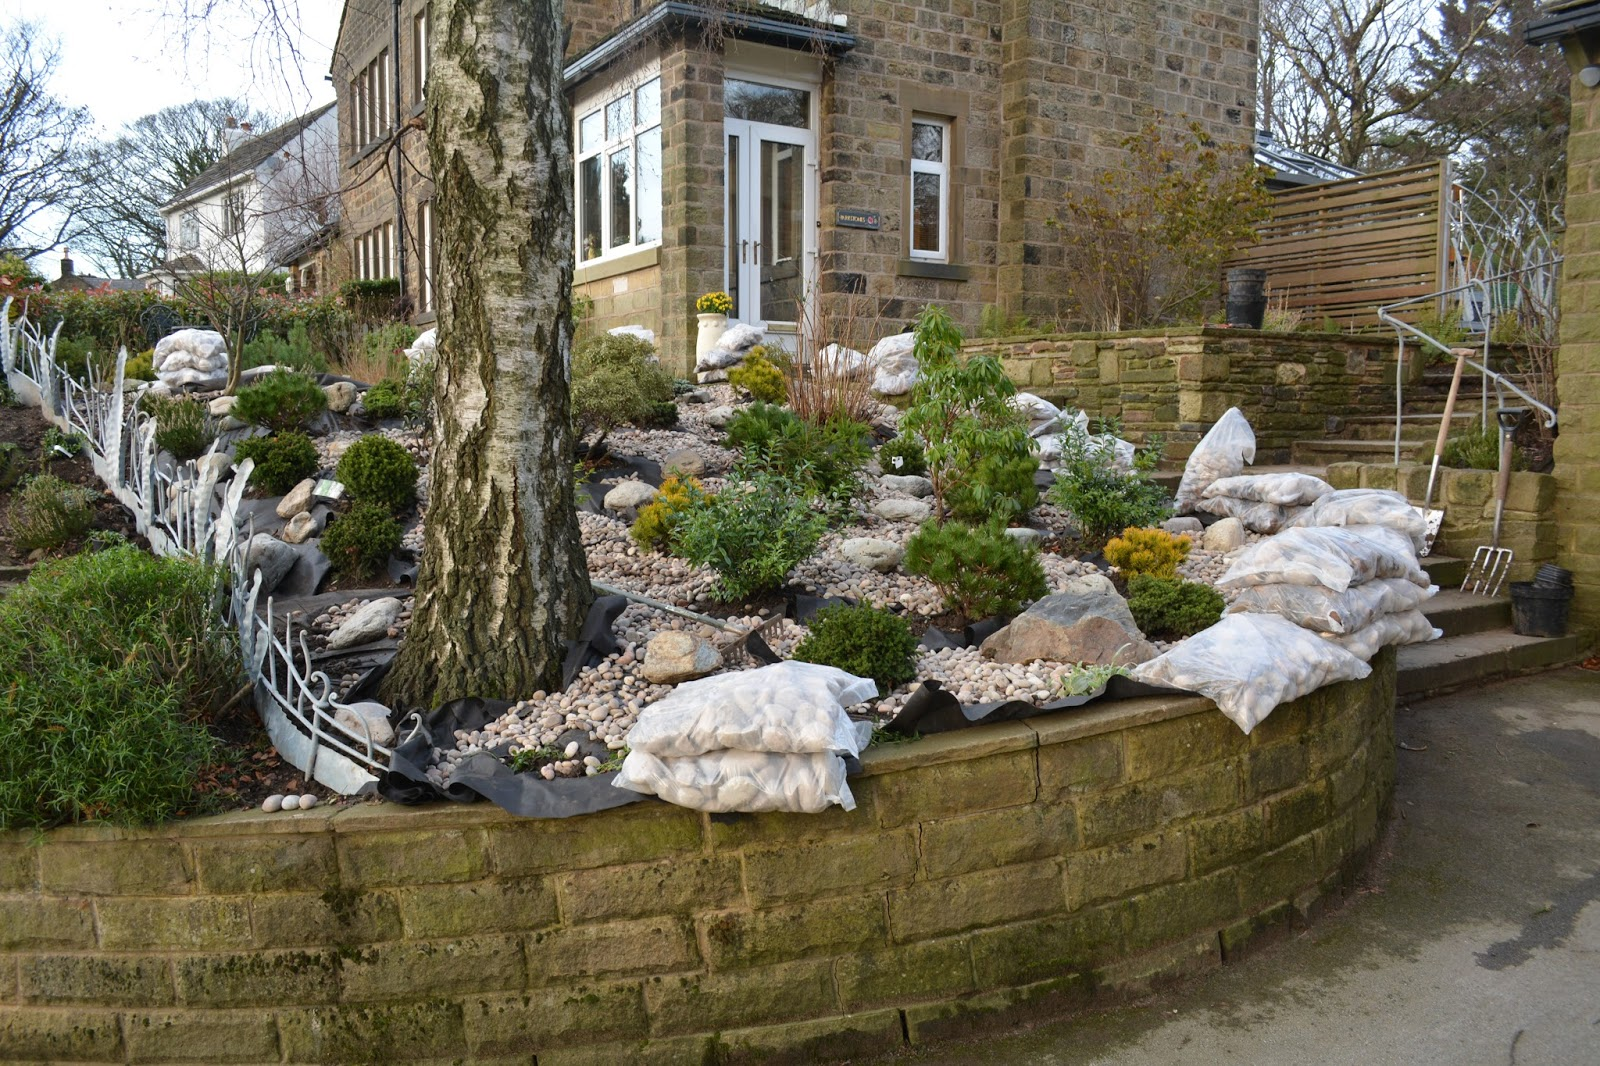 David Keegans Garden Design Blog: December 2015